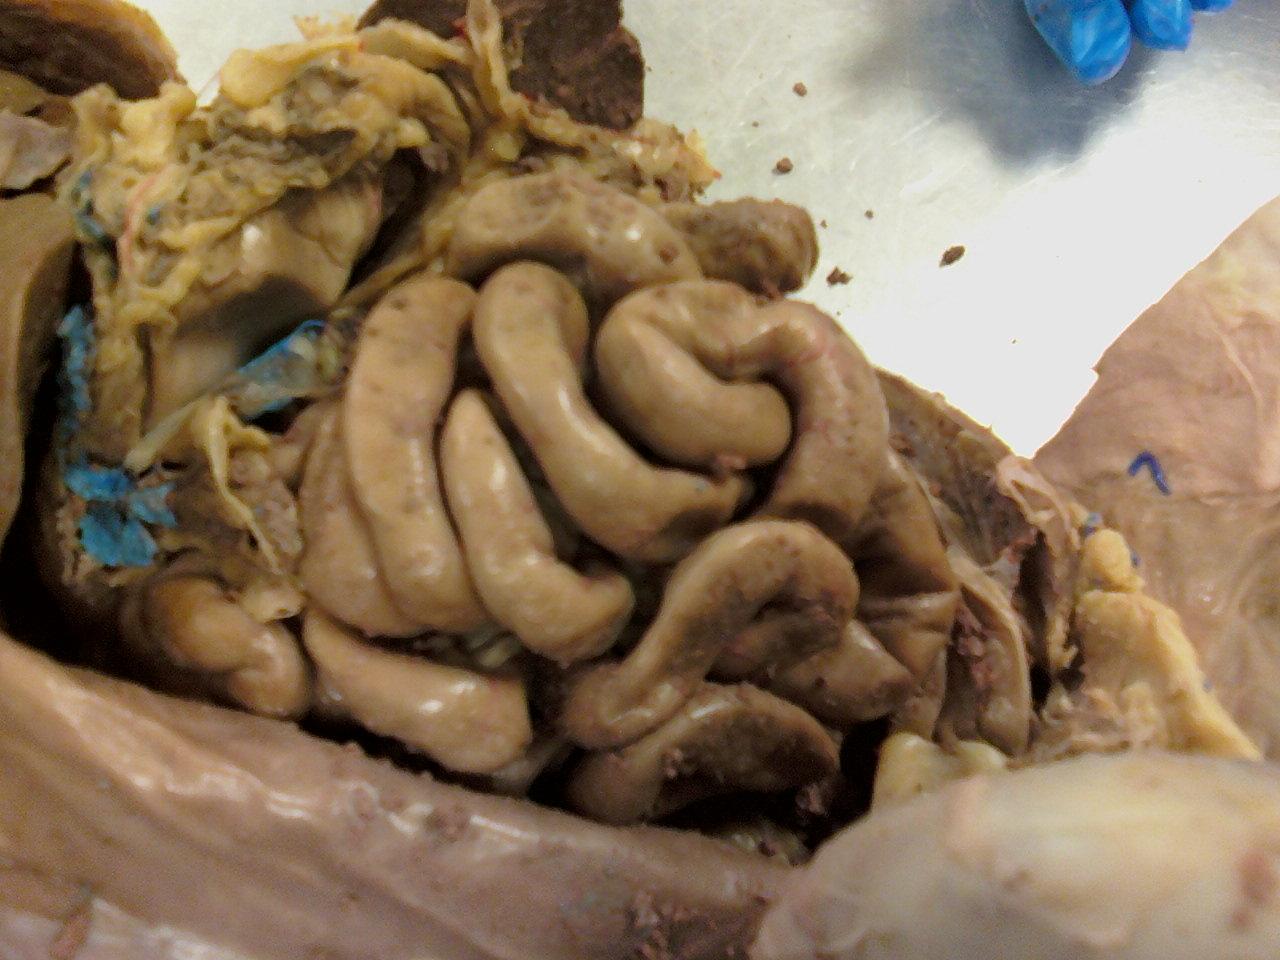 Real Human Intestine